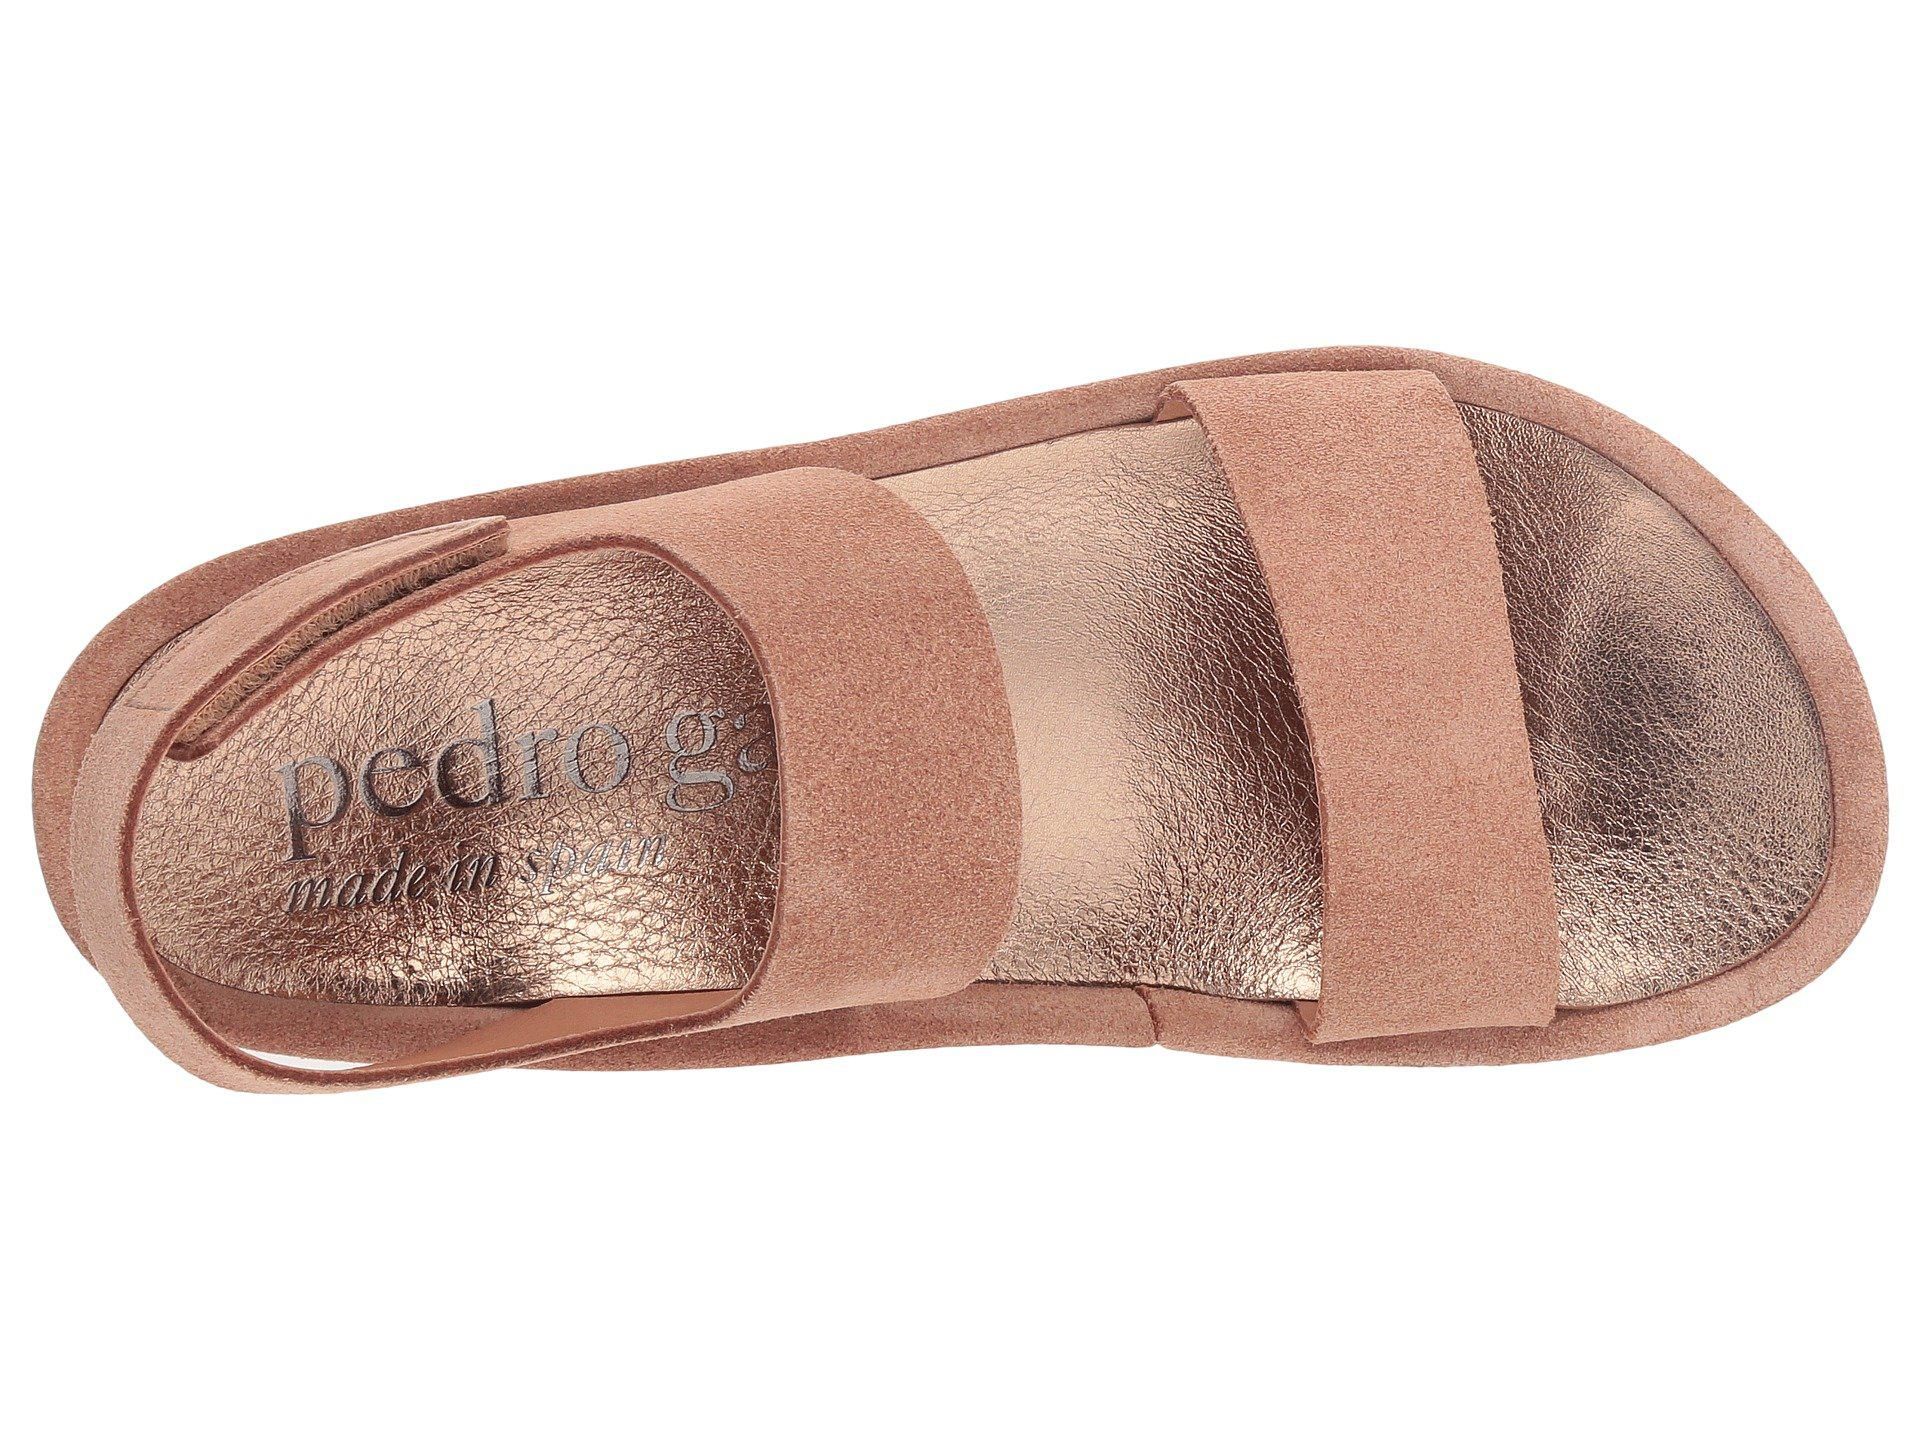 46728e33724 Lyst - Pedro Garcia Lacey 050 (macaron Castoro) Women s Wedge Shoes